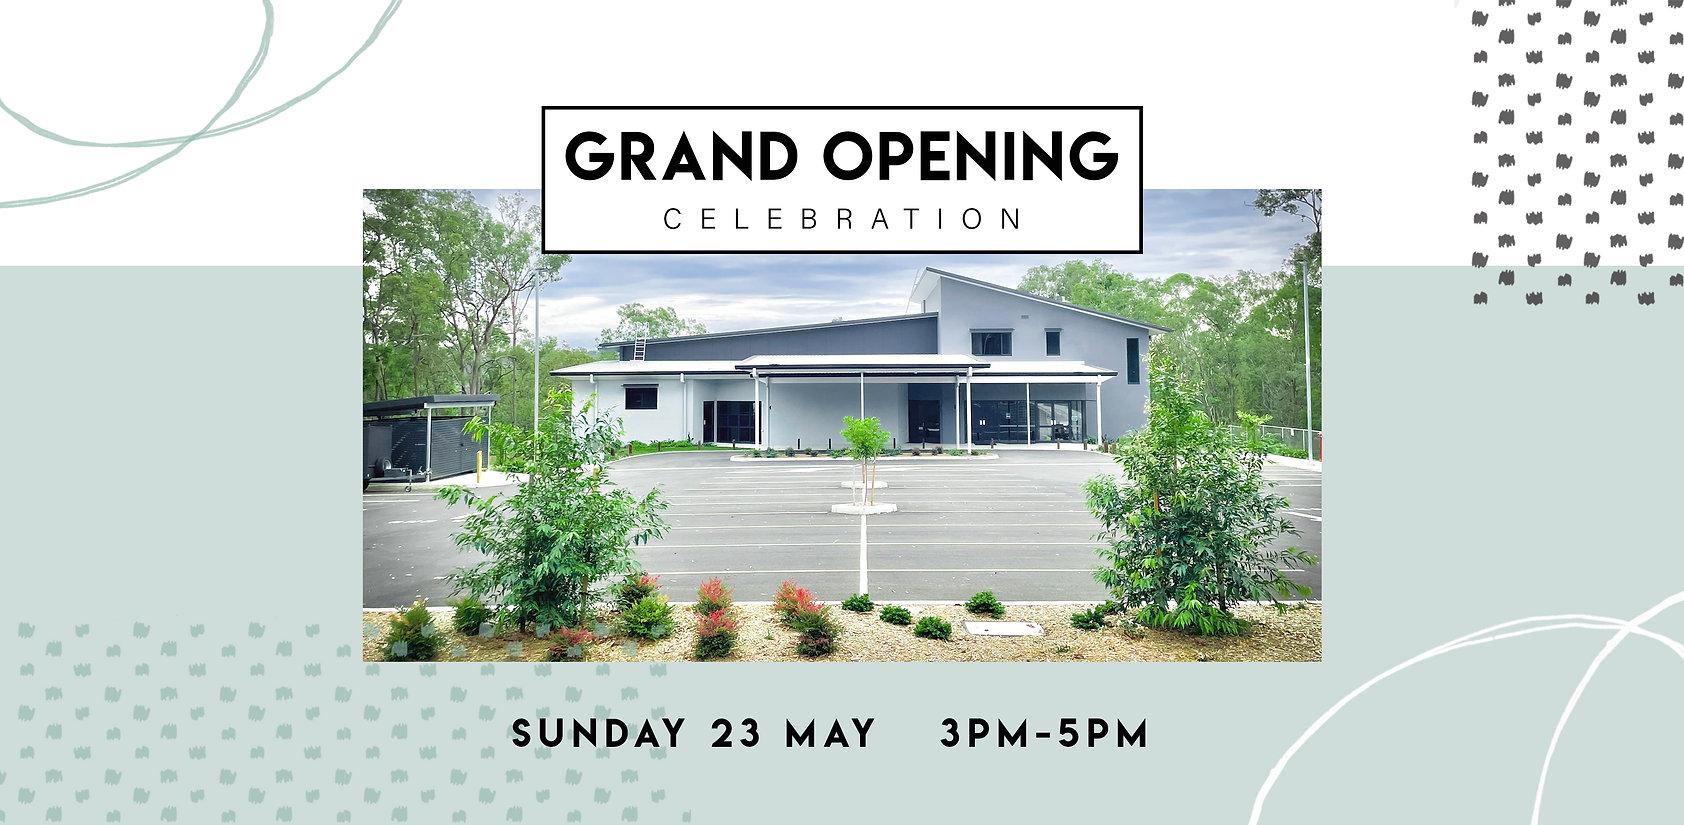 Grand Opening website 2.jpg